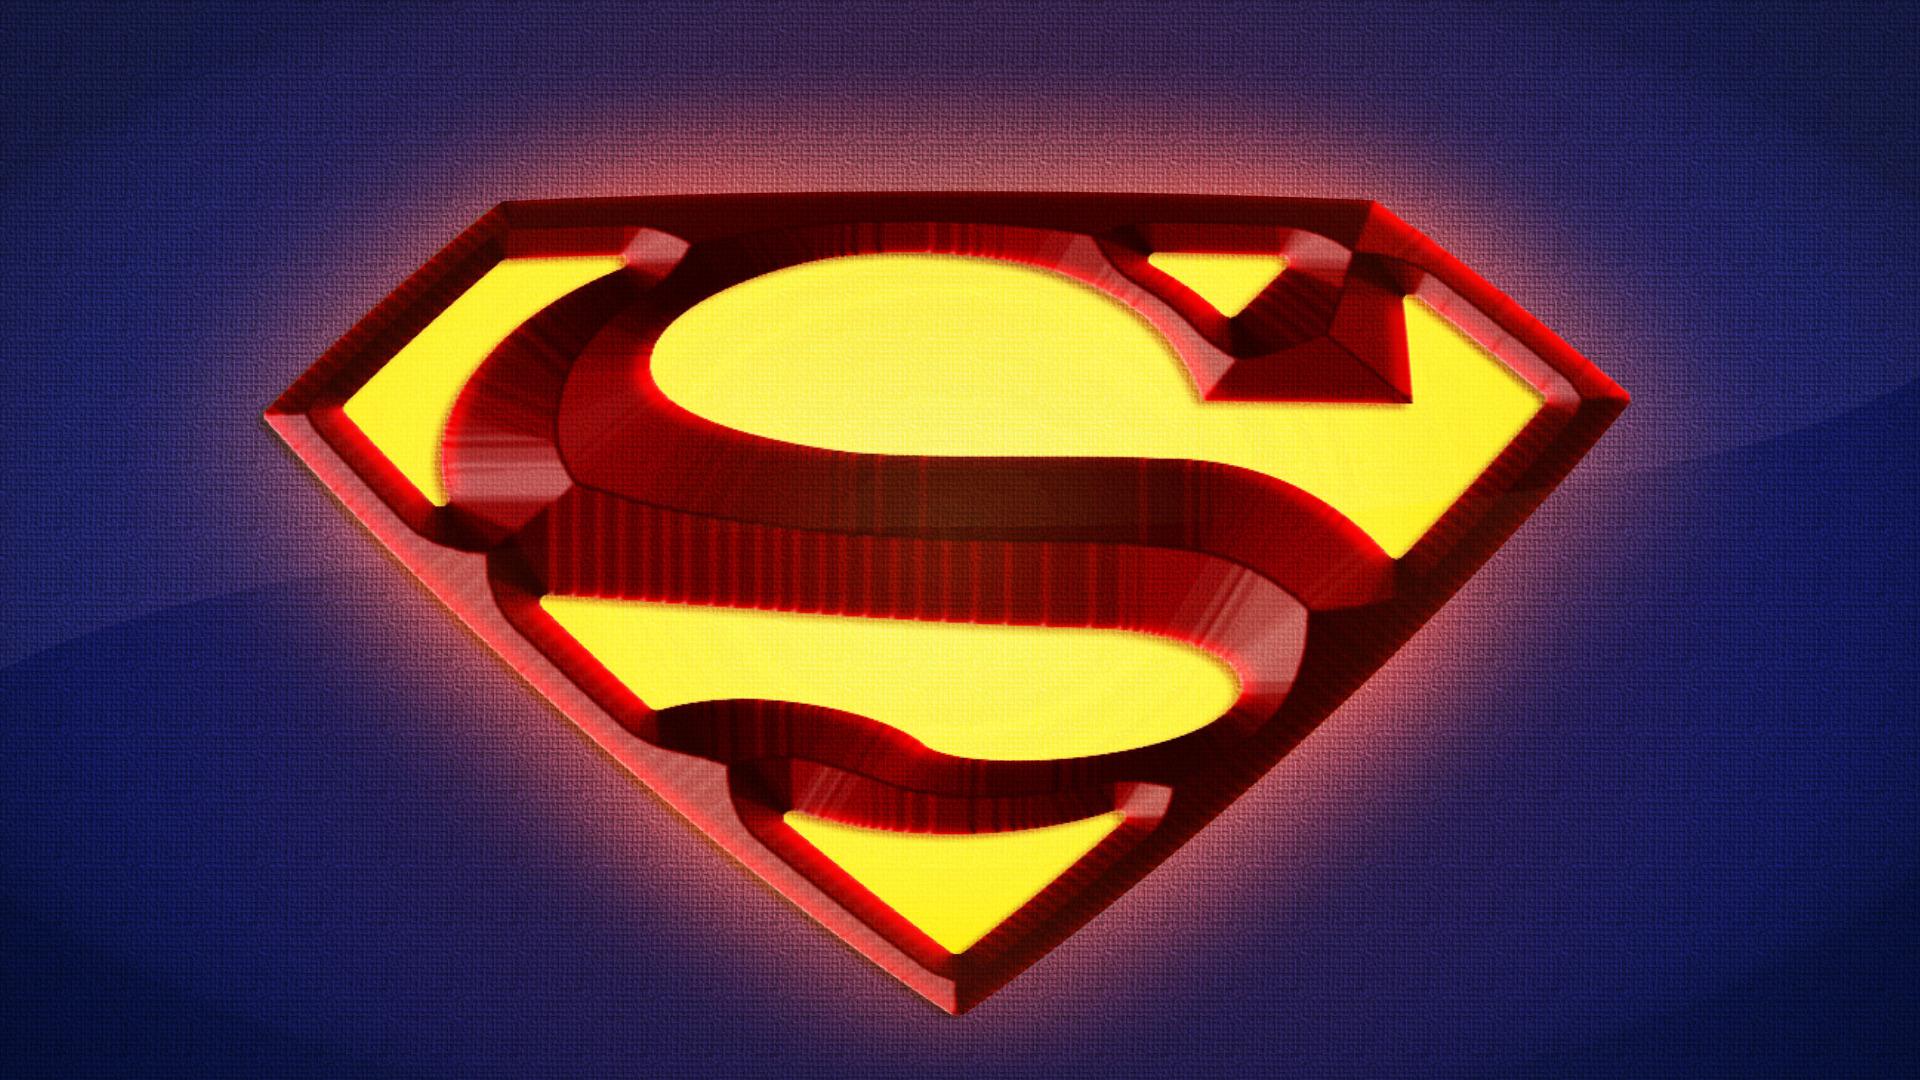 Superman Logo Hd Wallpapers Backgrounds Wallpaper 1920x1080